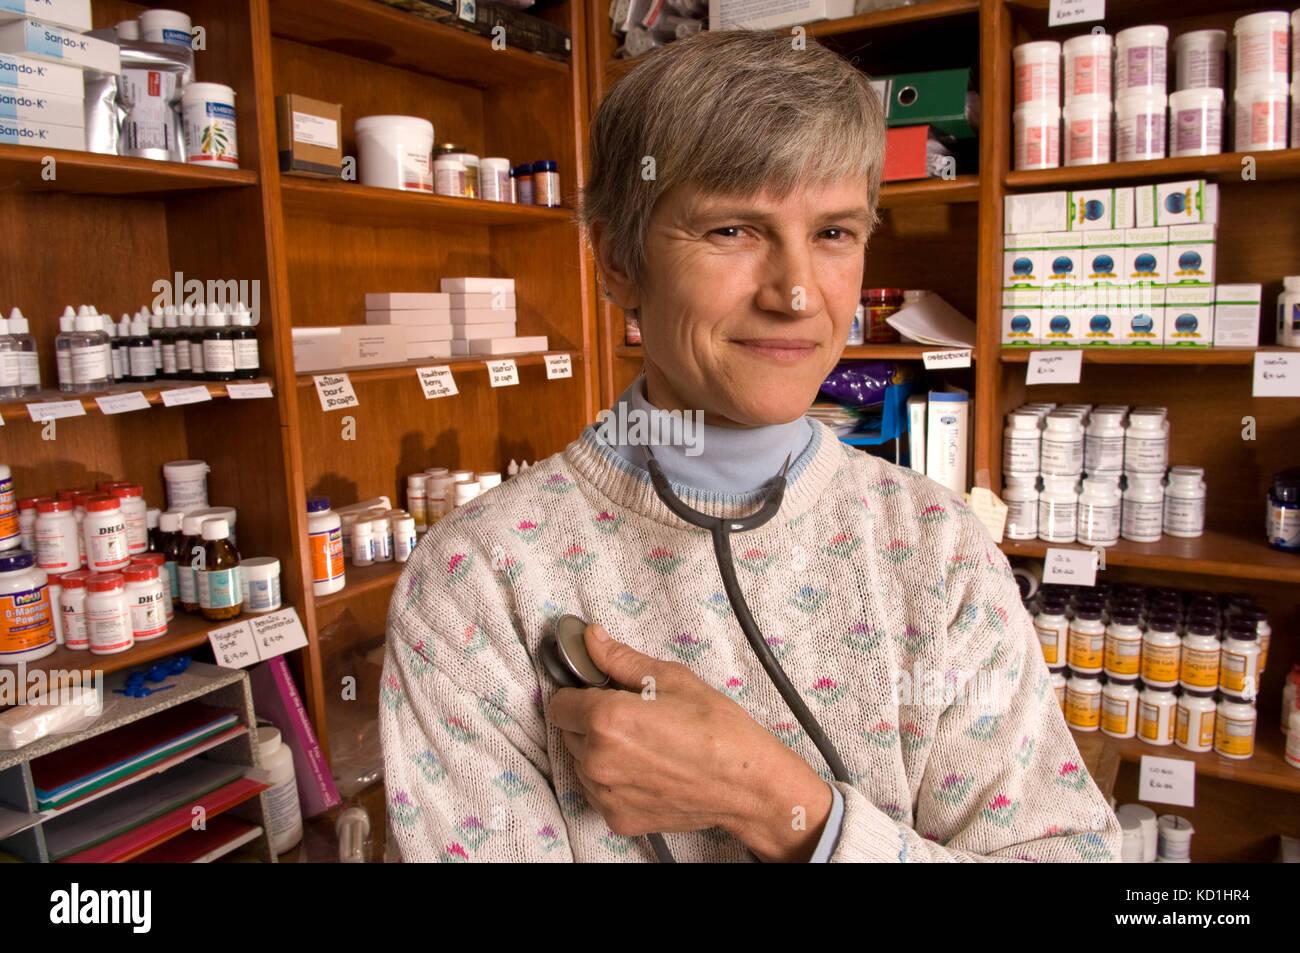 Alternative Therapie Practitioner, Dr. Sarah myhill an ihrem Haus/Praxis in Knighton, Powys, Wales. Stockbild